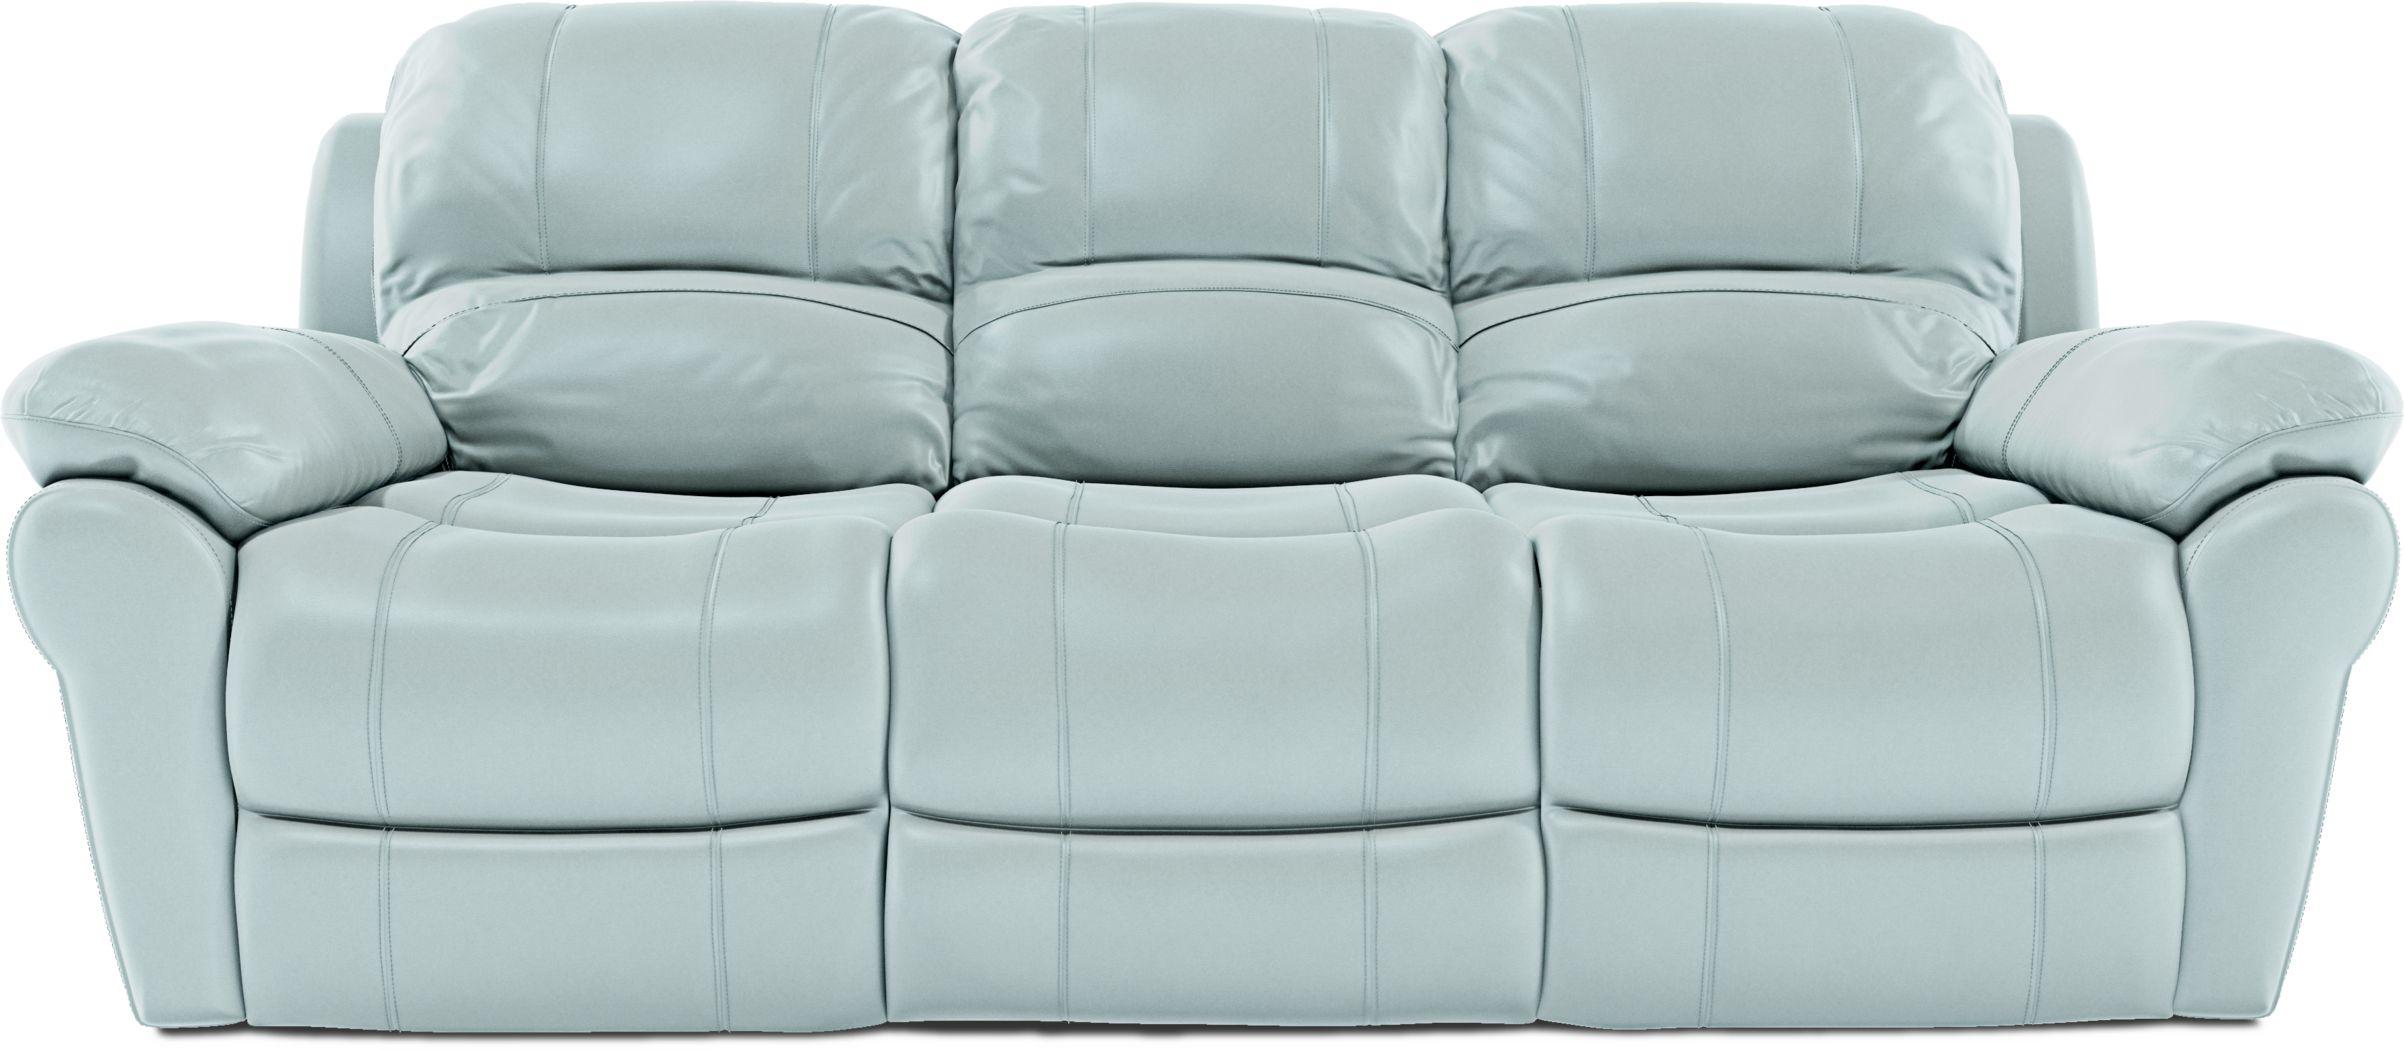 Vercelli Aqua Leather Reclining Sofa